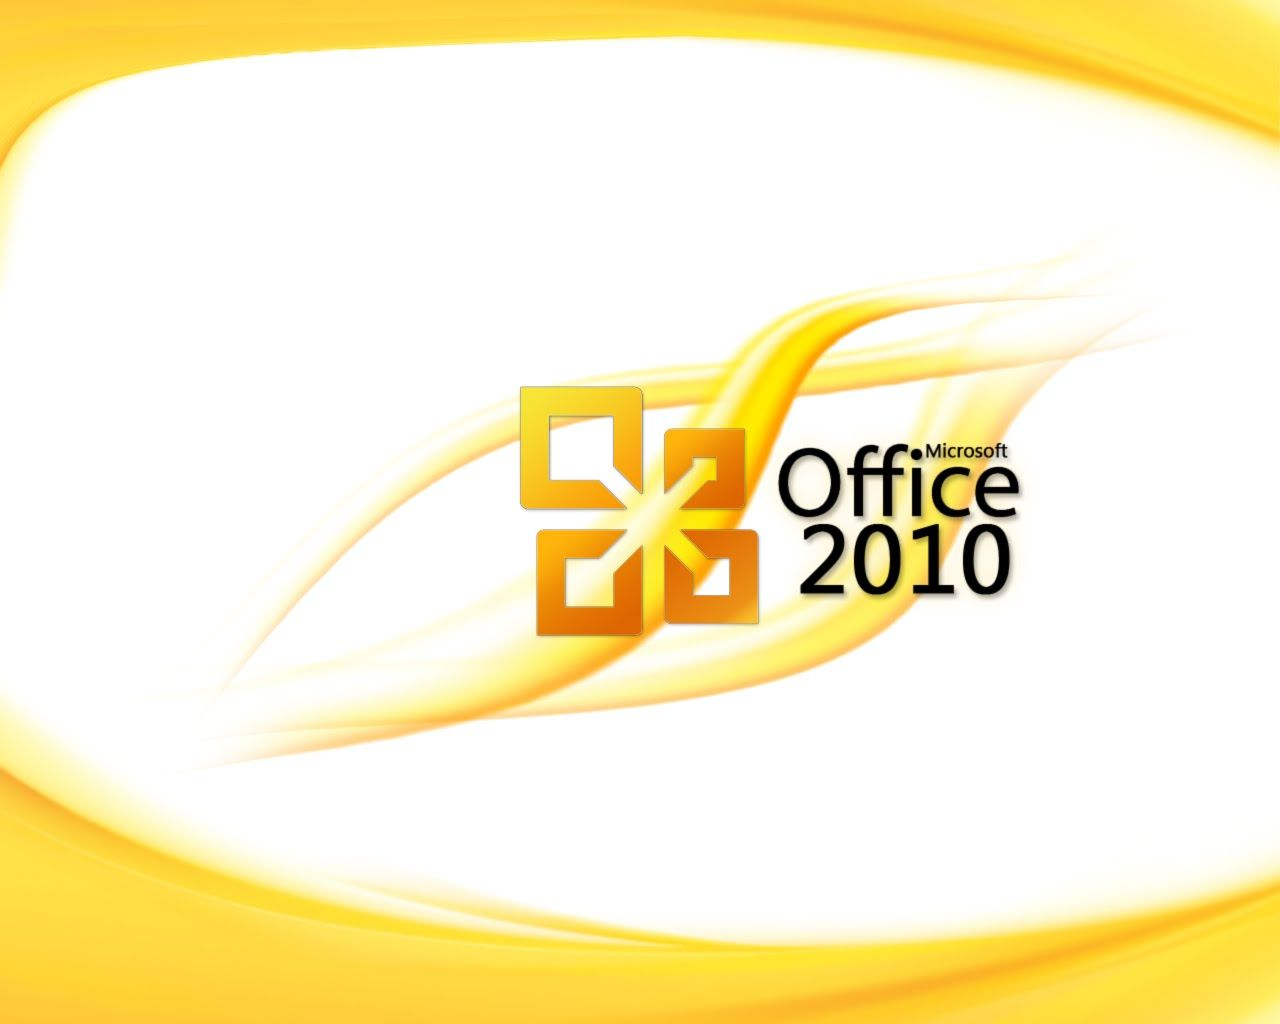 office 2010 gratis en español full